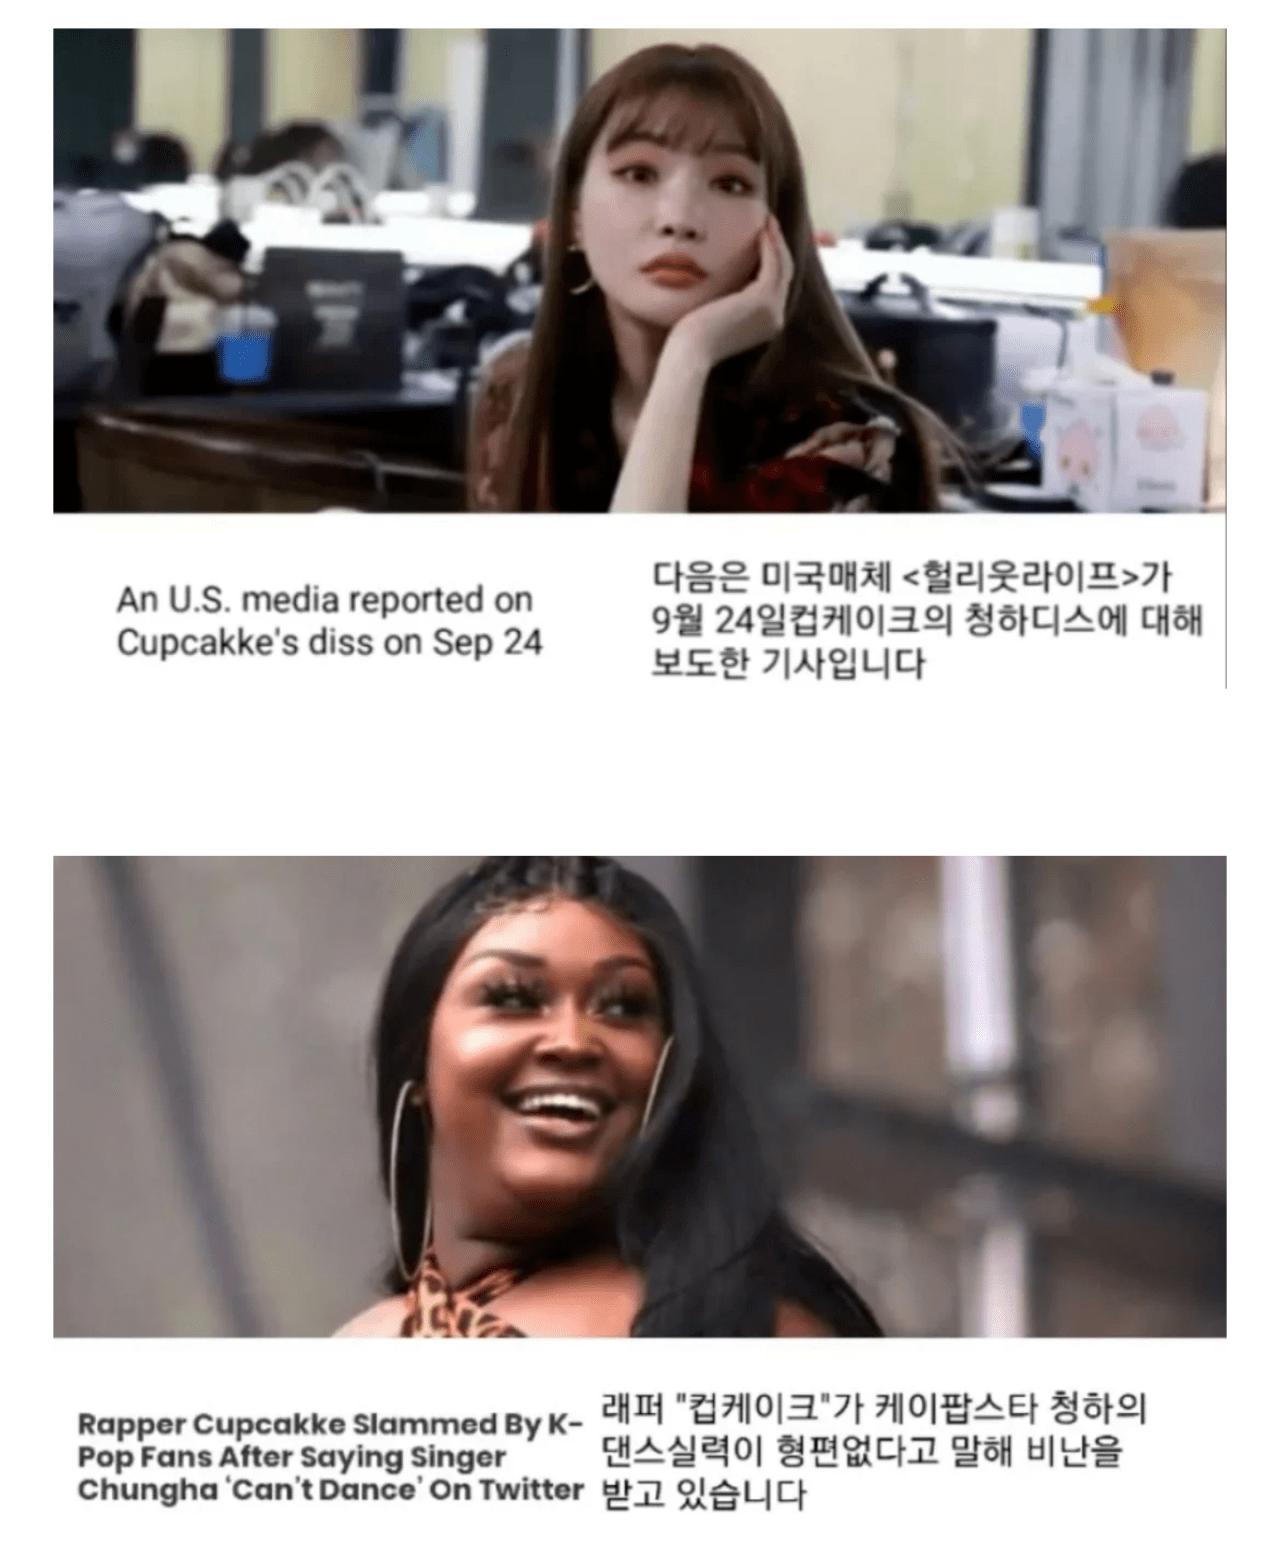 Screenshot_20191010-170457(1).png 혐) 미국 래퍼에게 춤 못춘다고 디스당한 청하